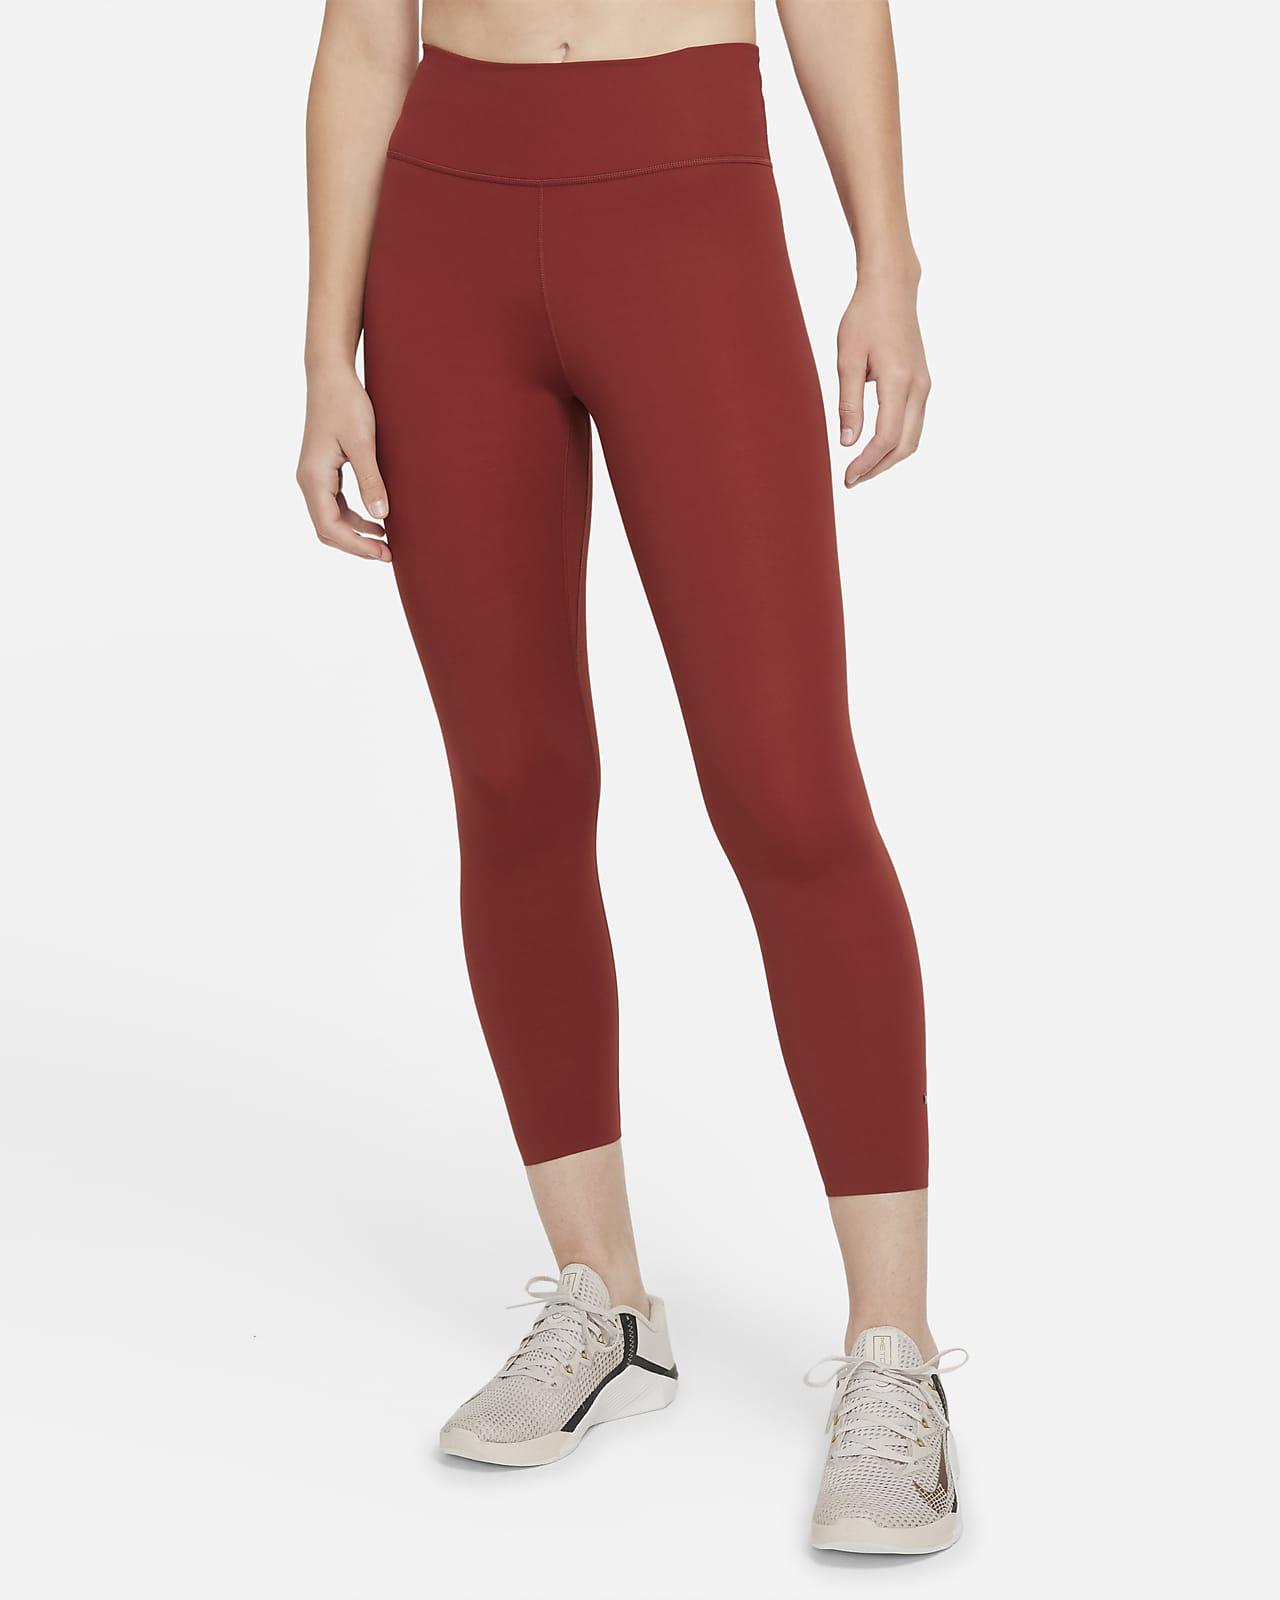 Nike One Luxe Women's Mid-Rise Crop Leggings